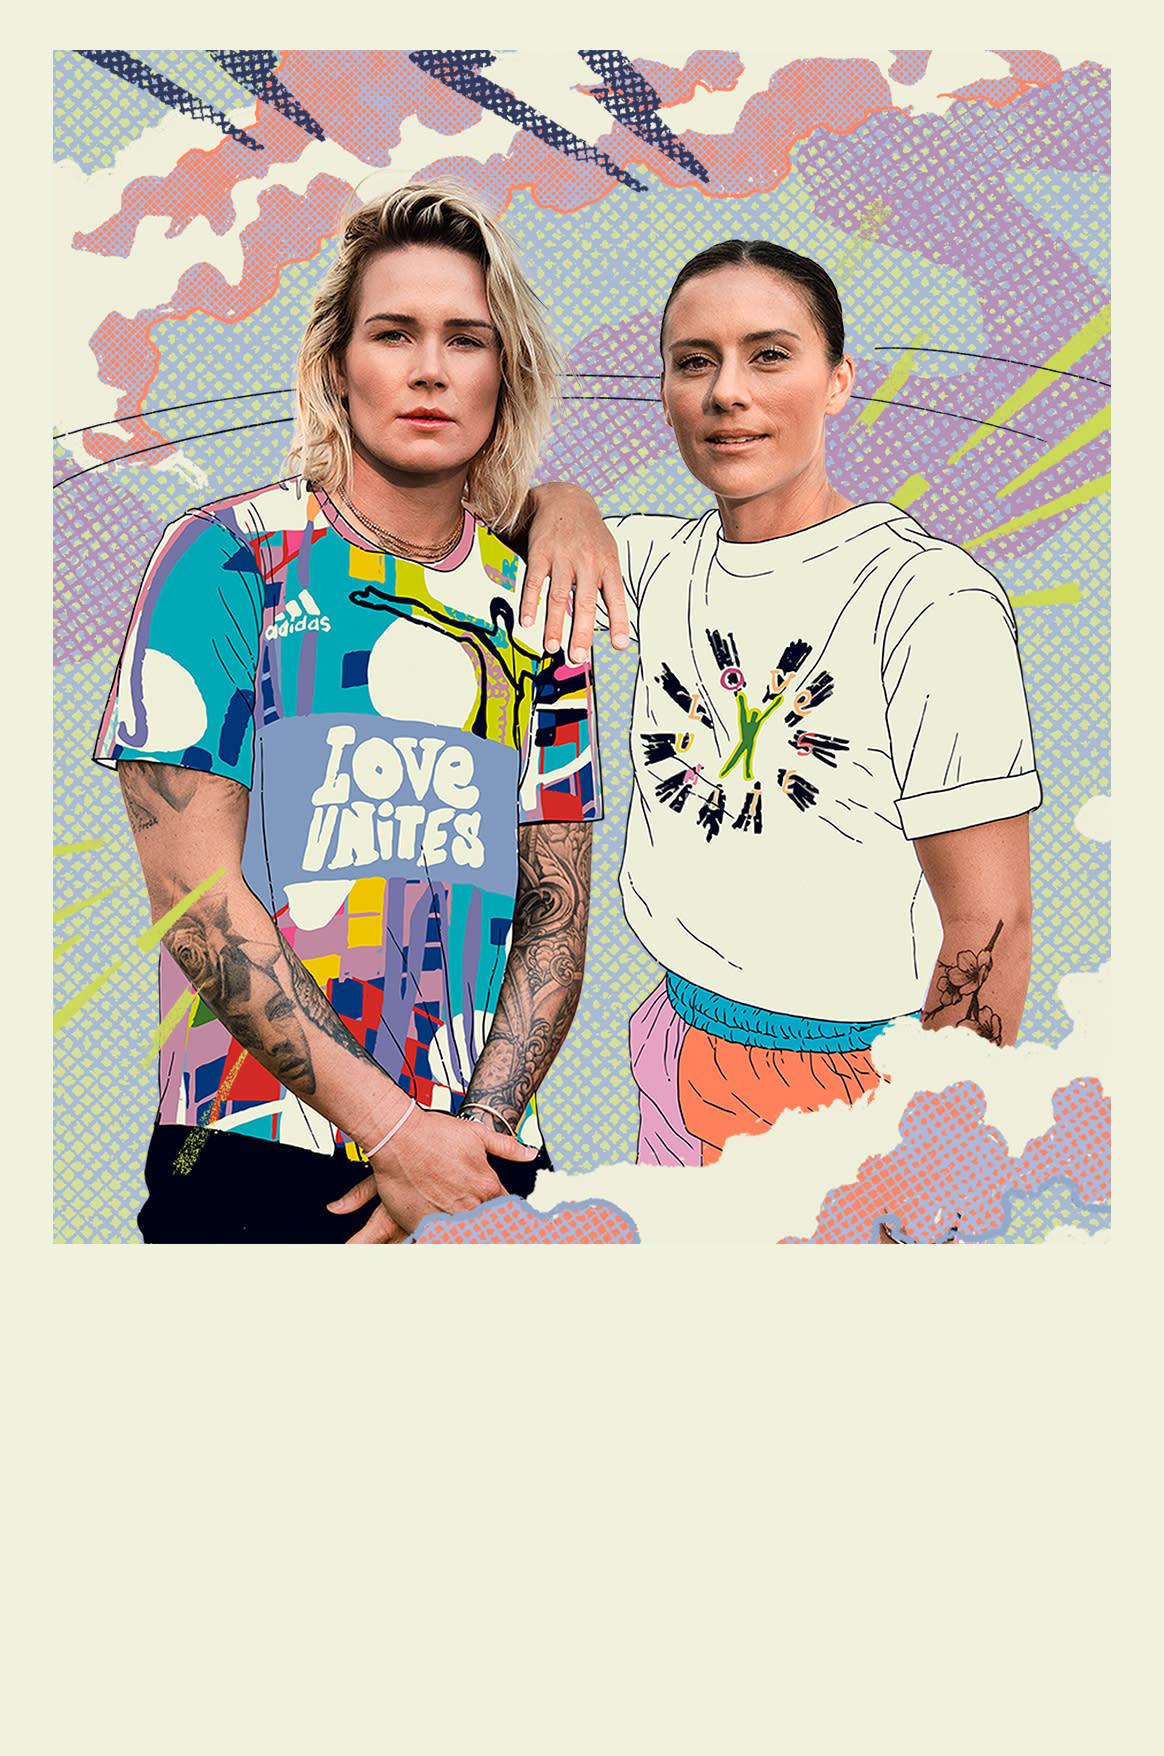 Collage featuring Pride representatives Ali Krieger and Ashlyn Harris.